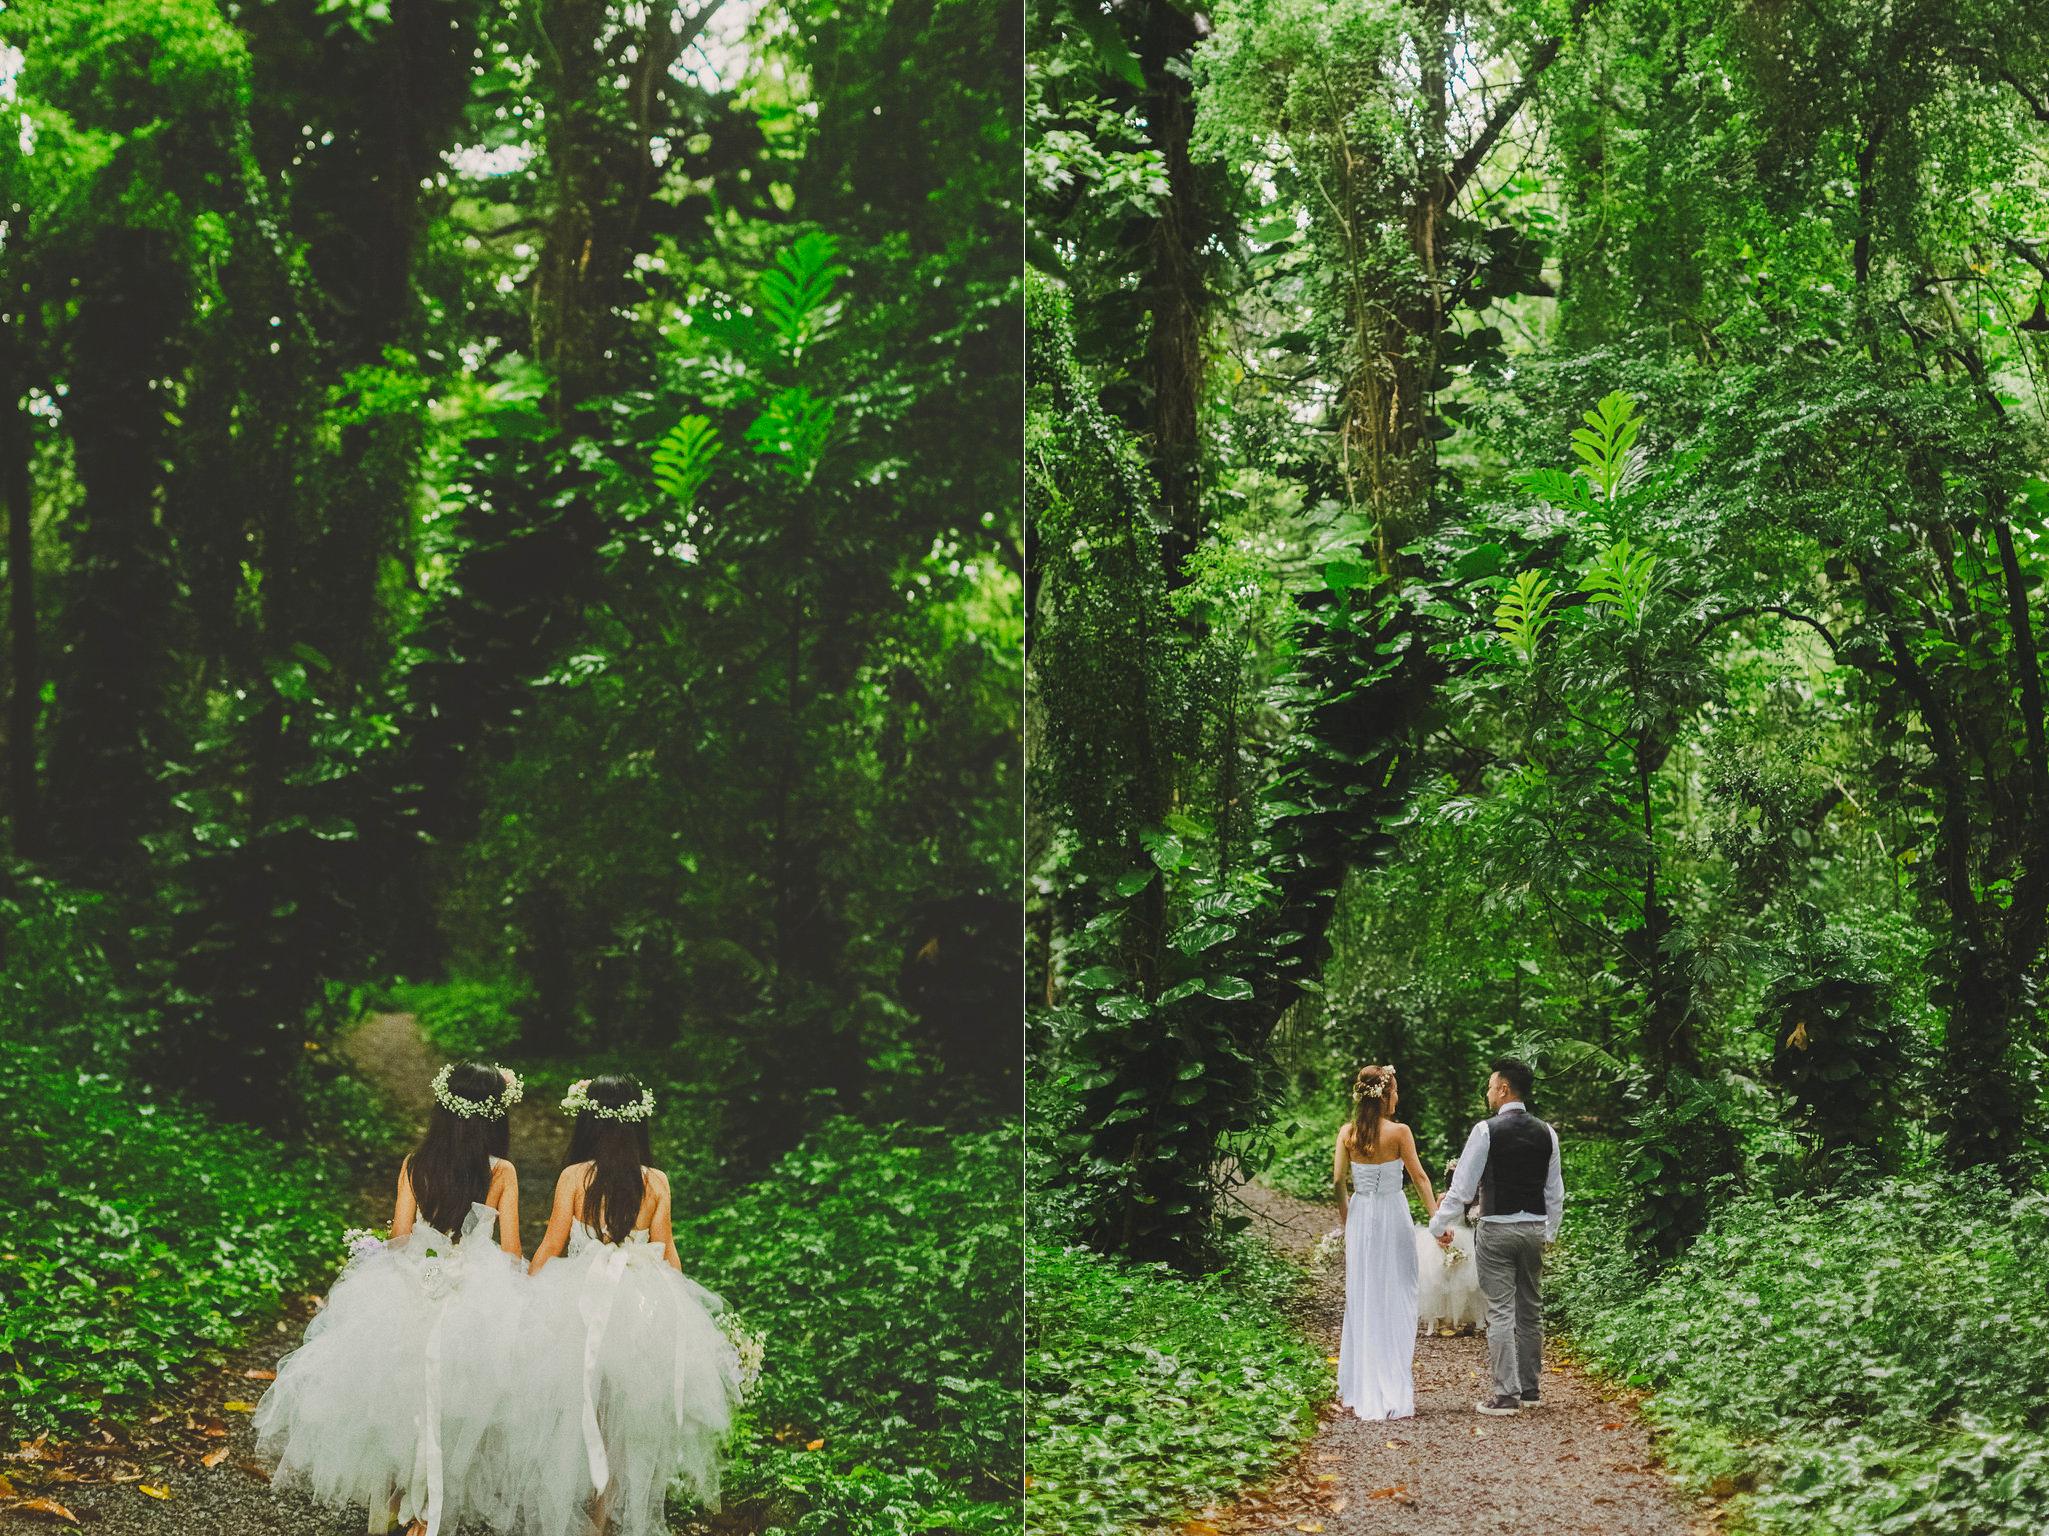 angie-diaz-photography-angela-daniel-vow-renewal-25.jpg